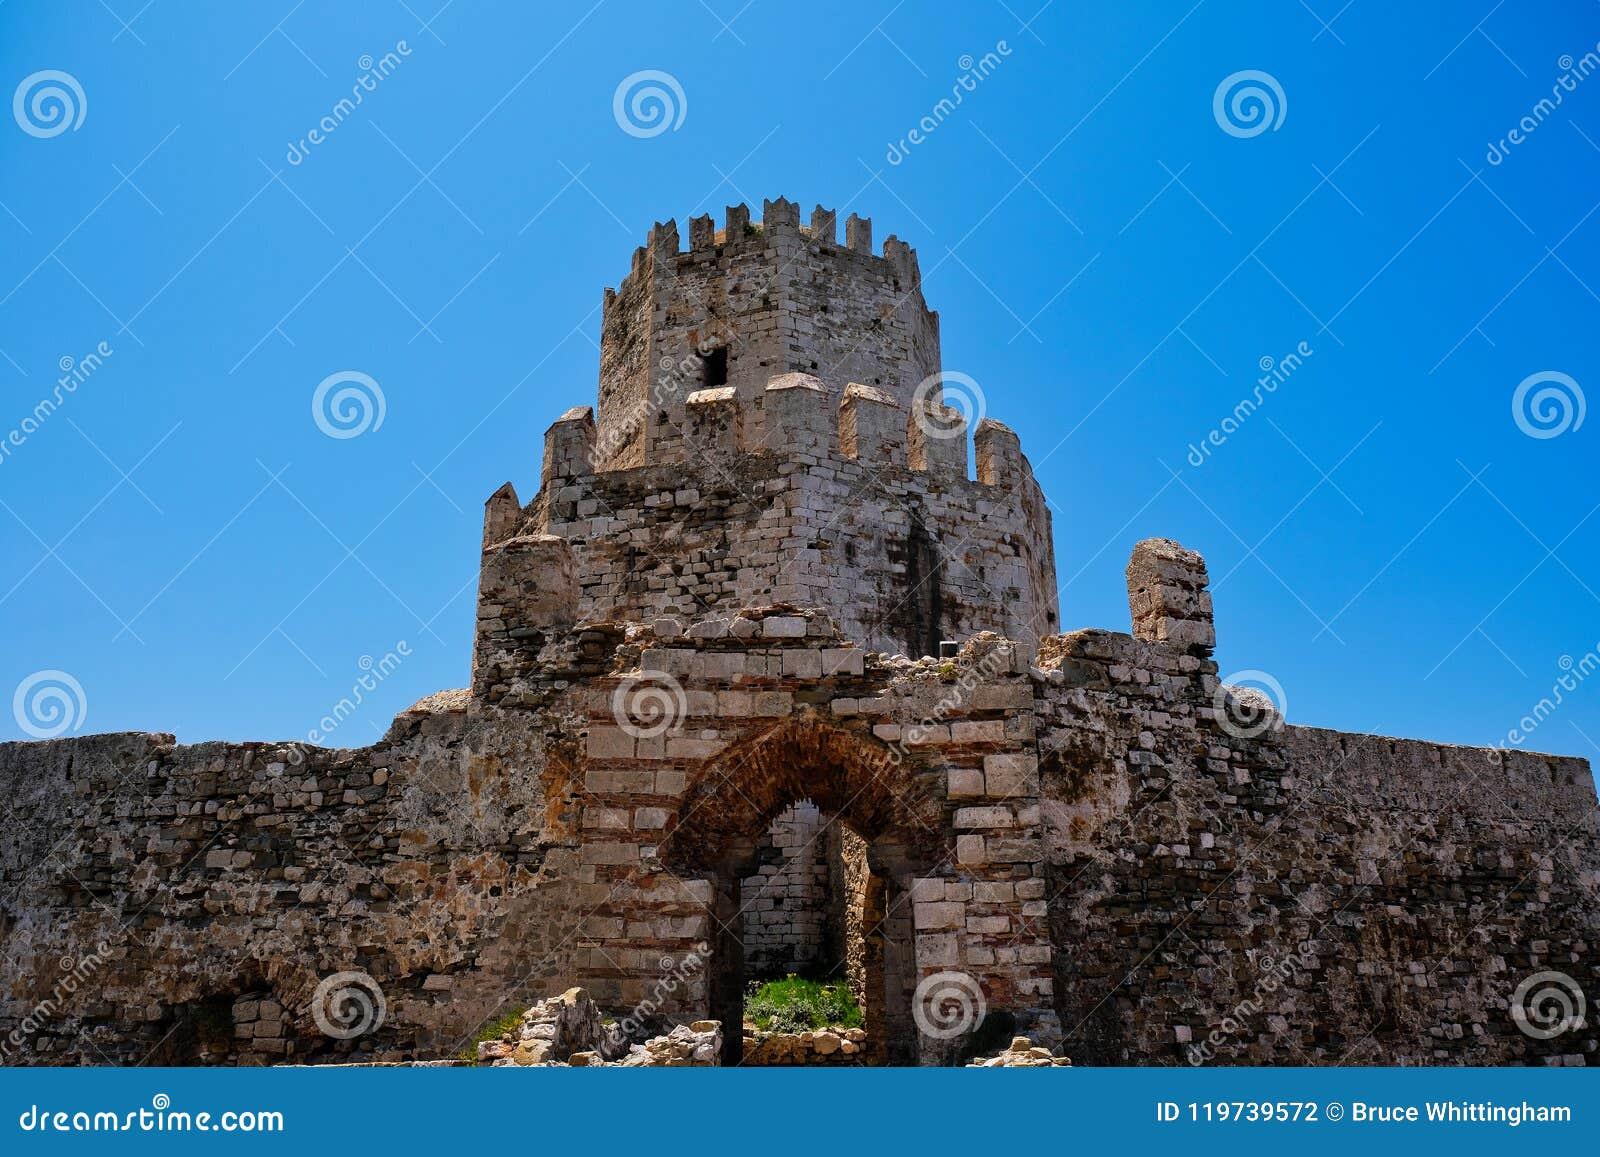 Medieval Methoni Castle Tower, Peloponnese, Greece